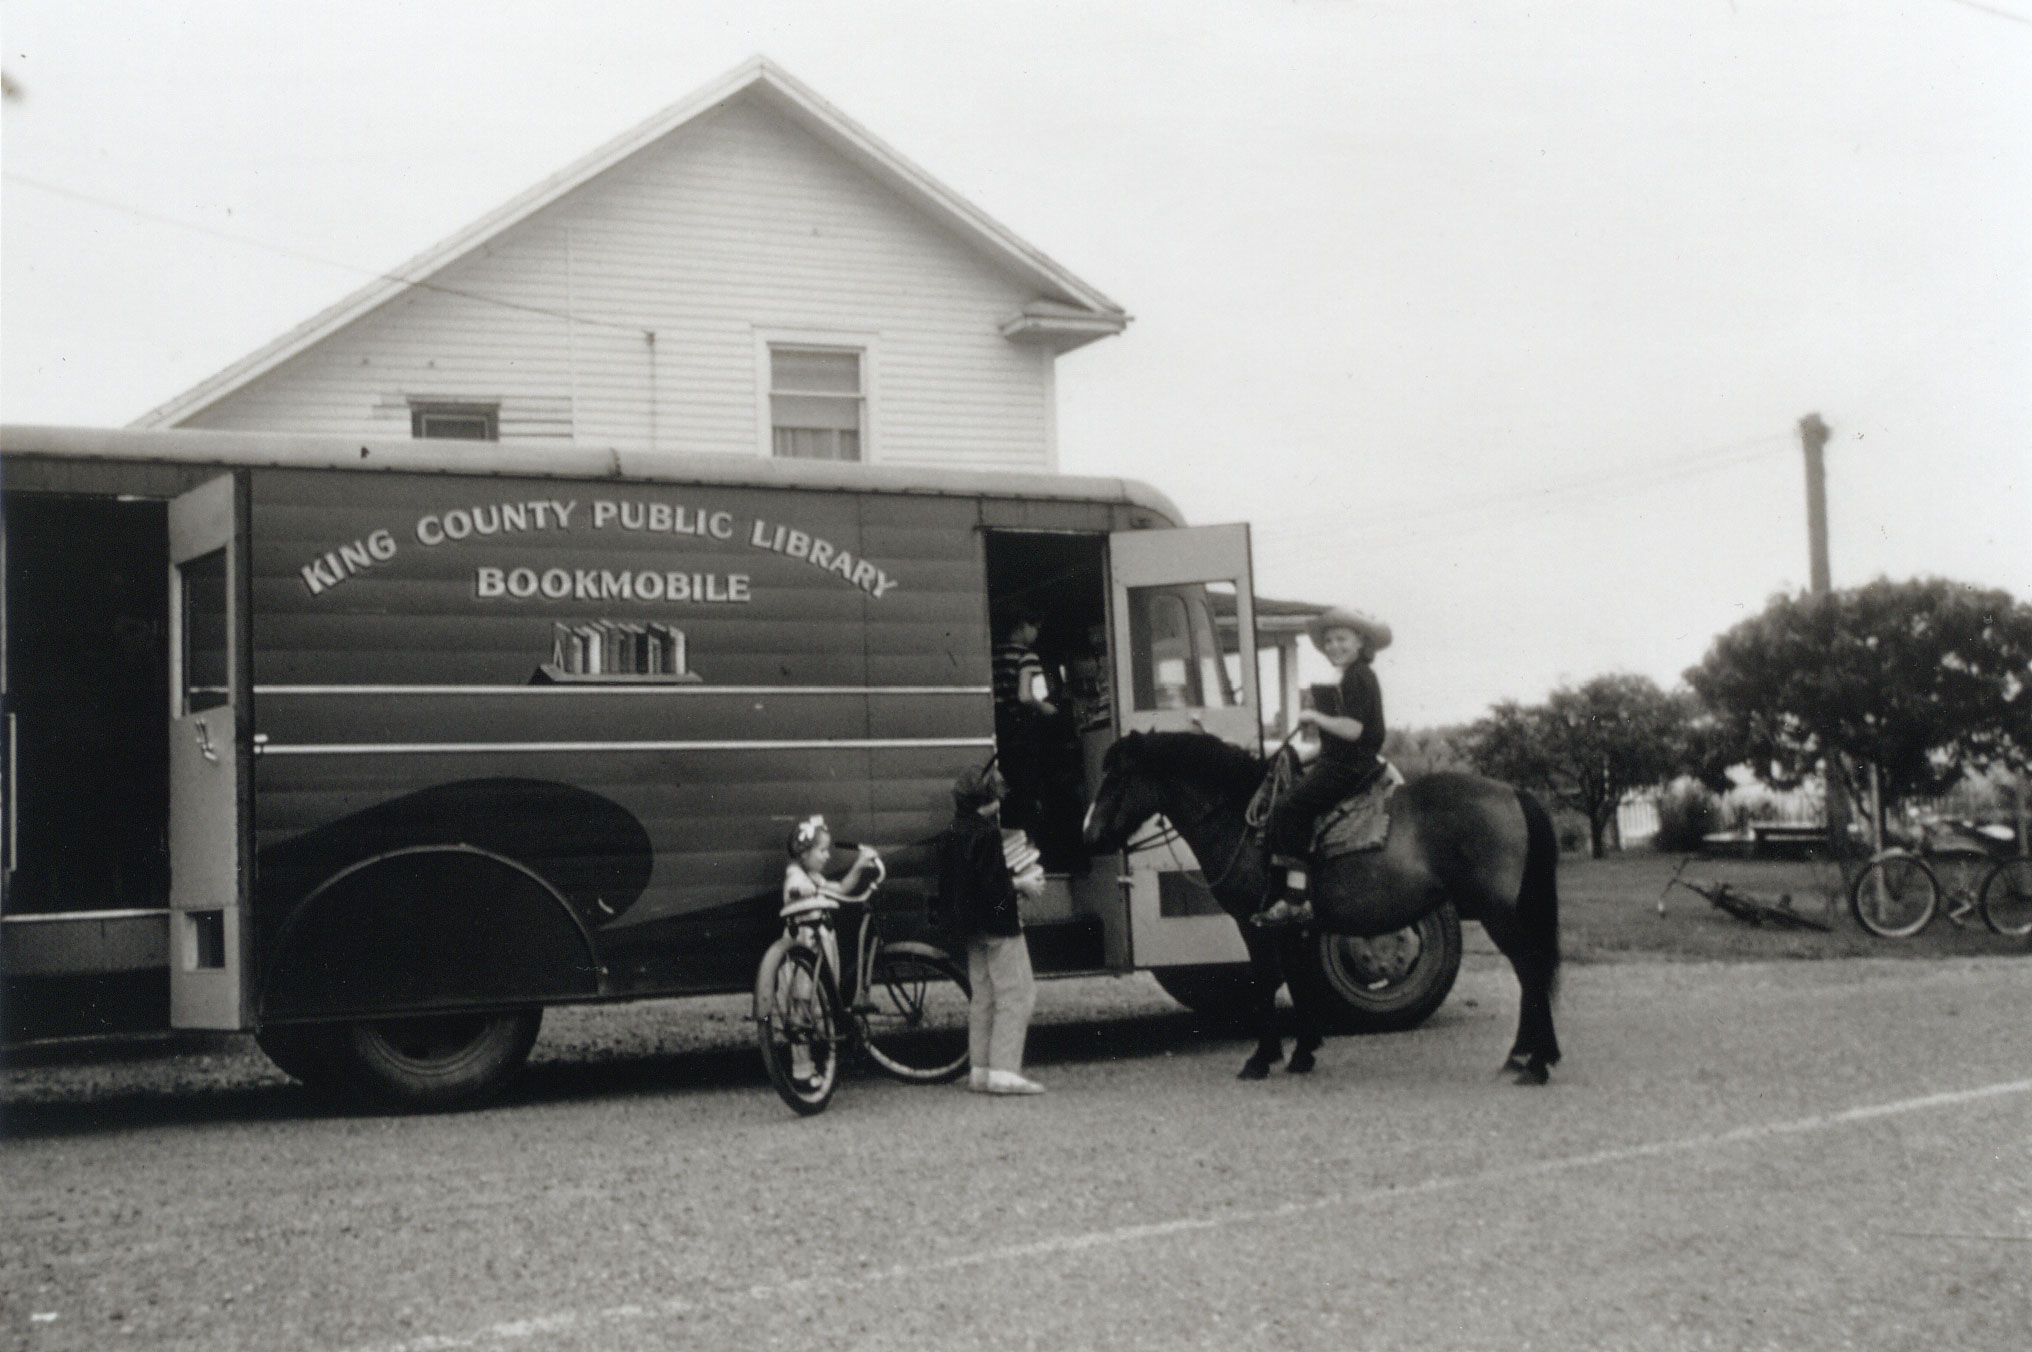 1947 - A second bookmobile, nicknamed